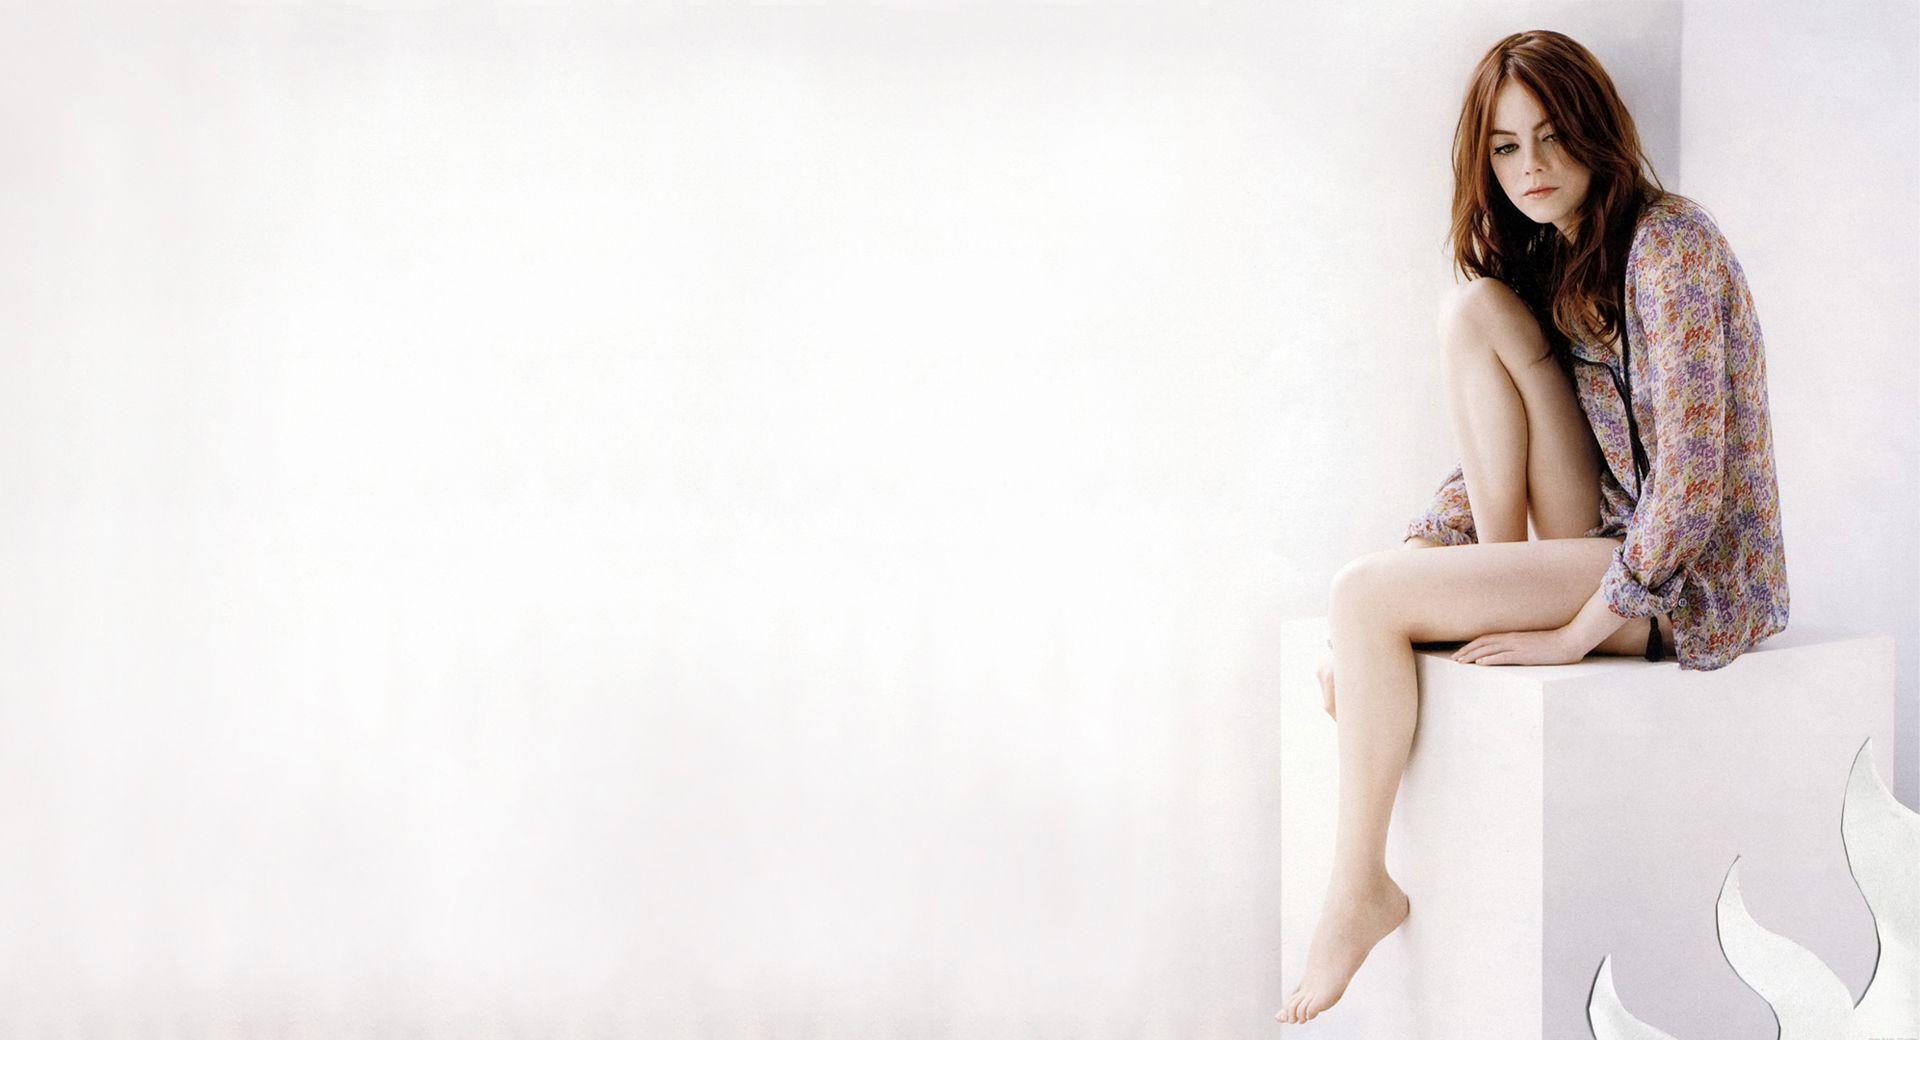 Emma Stone Free Wallpaper - Celebrities Powericare.com